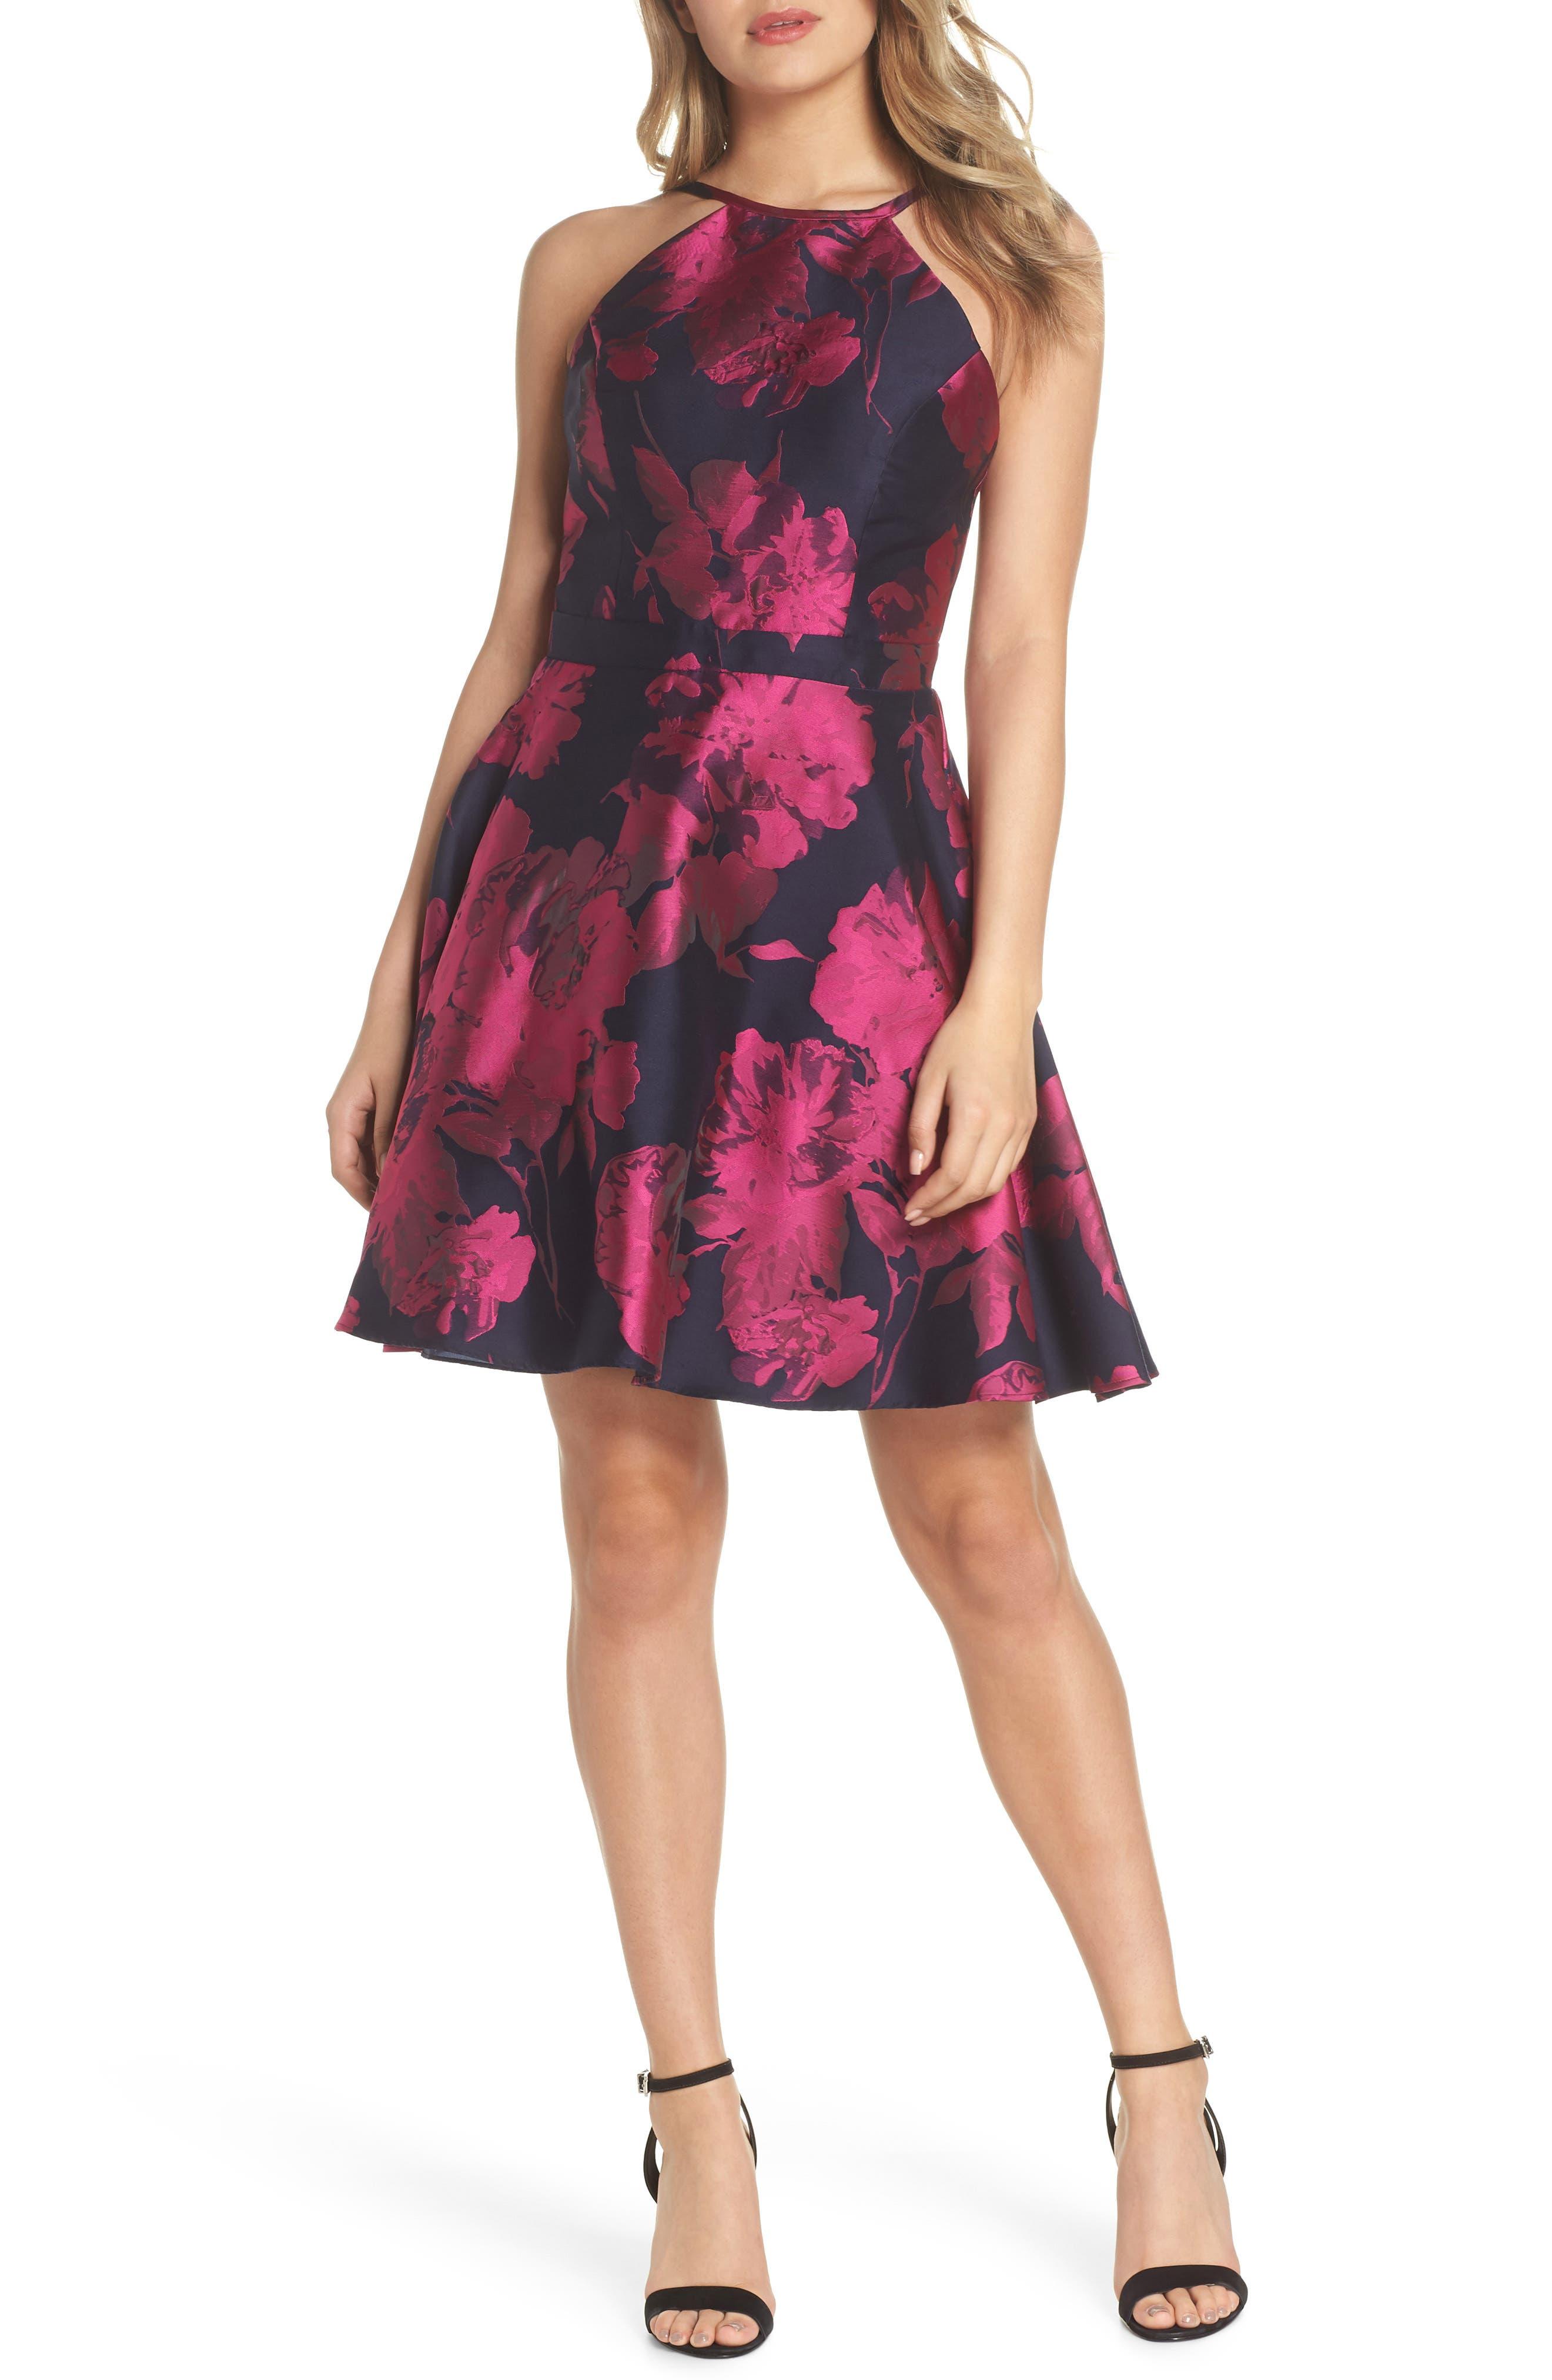 Alternate Image 1 Selected - Xscape Floral Brocade Fit & Flare Dress